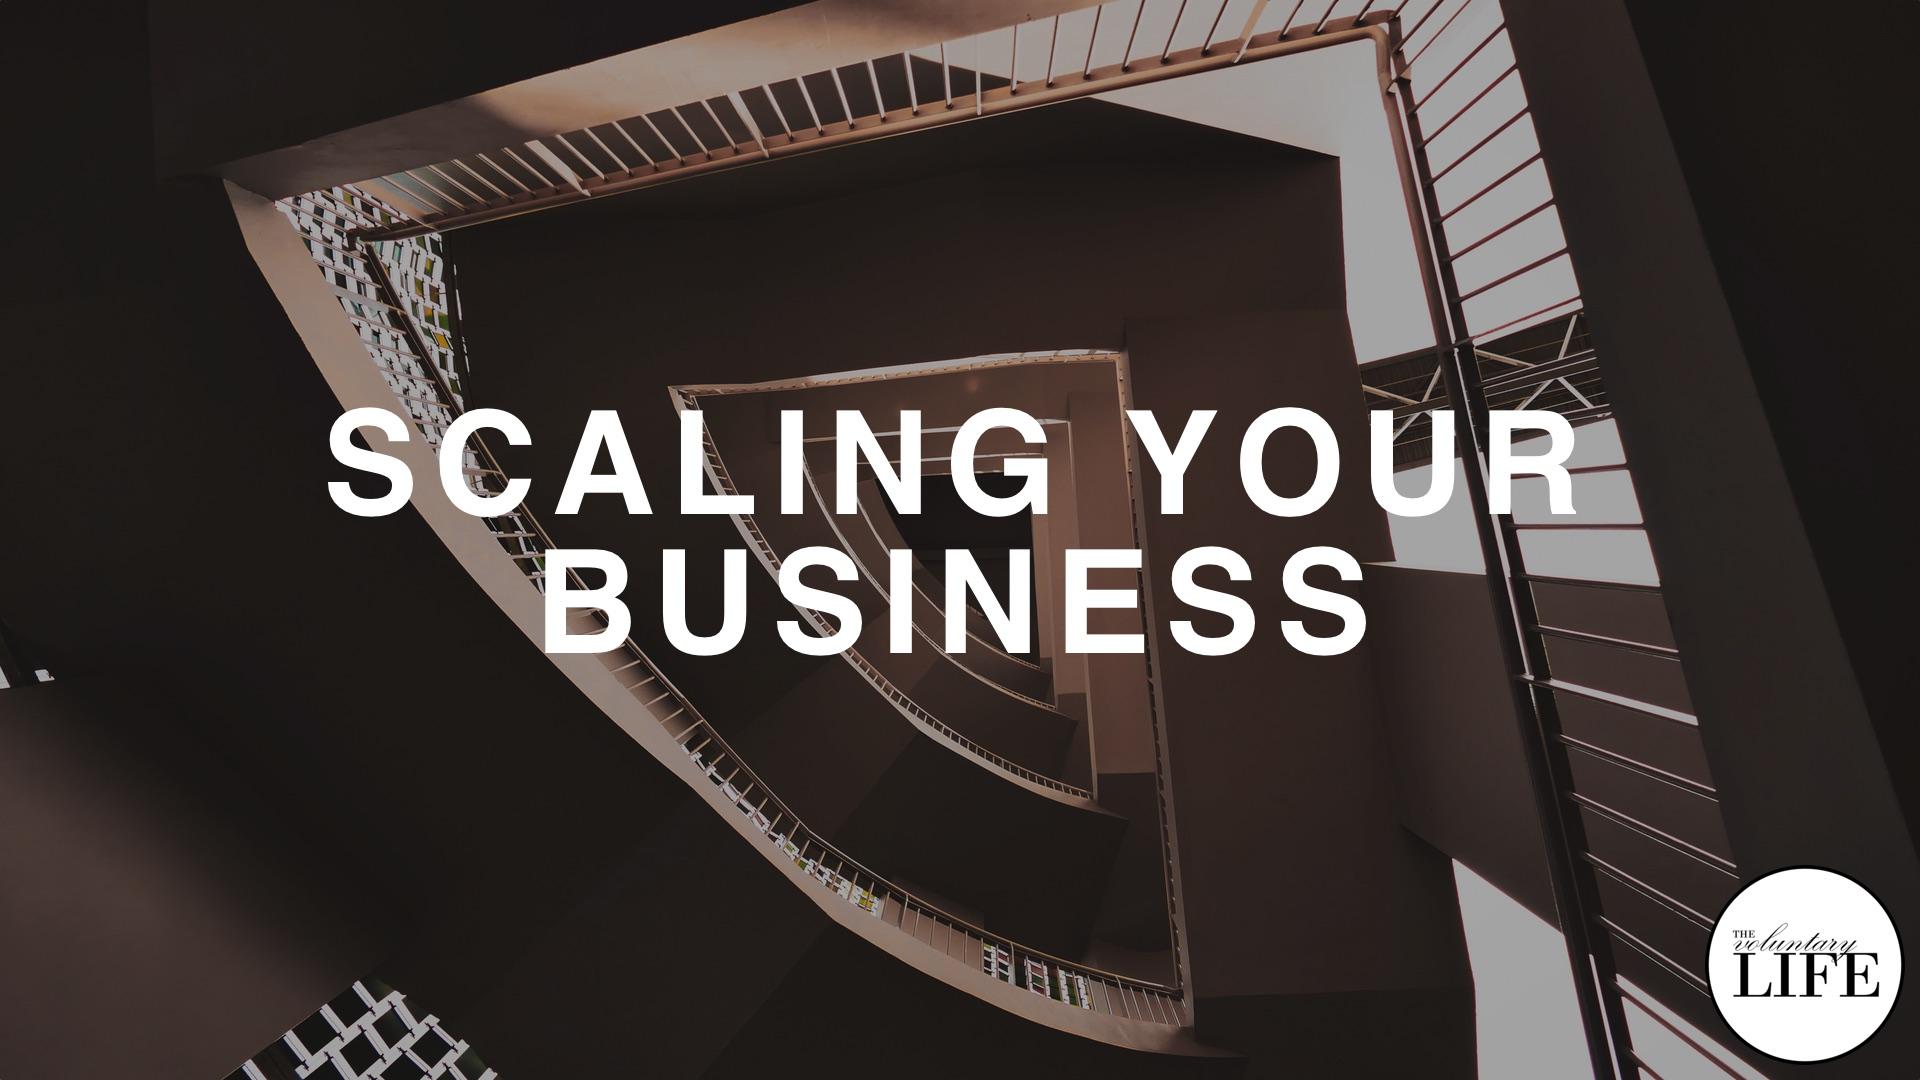 98 Entrepreneurship Part 15: Scaling Your Business